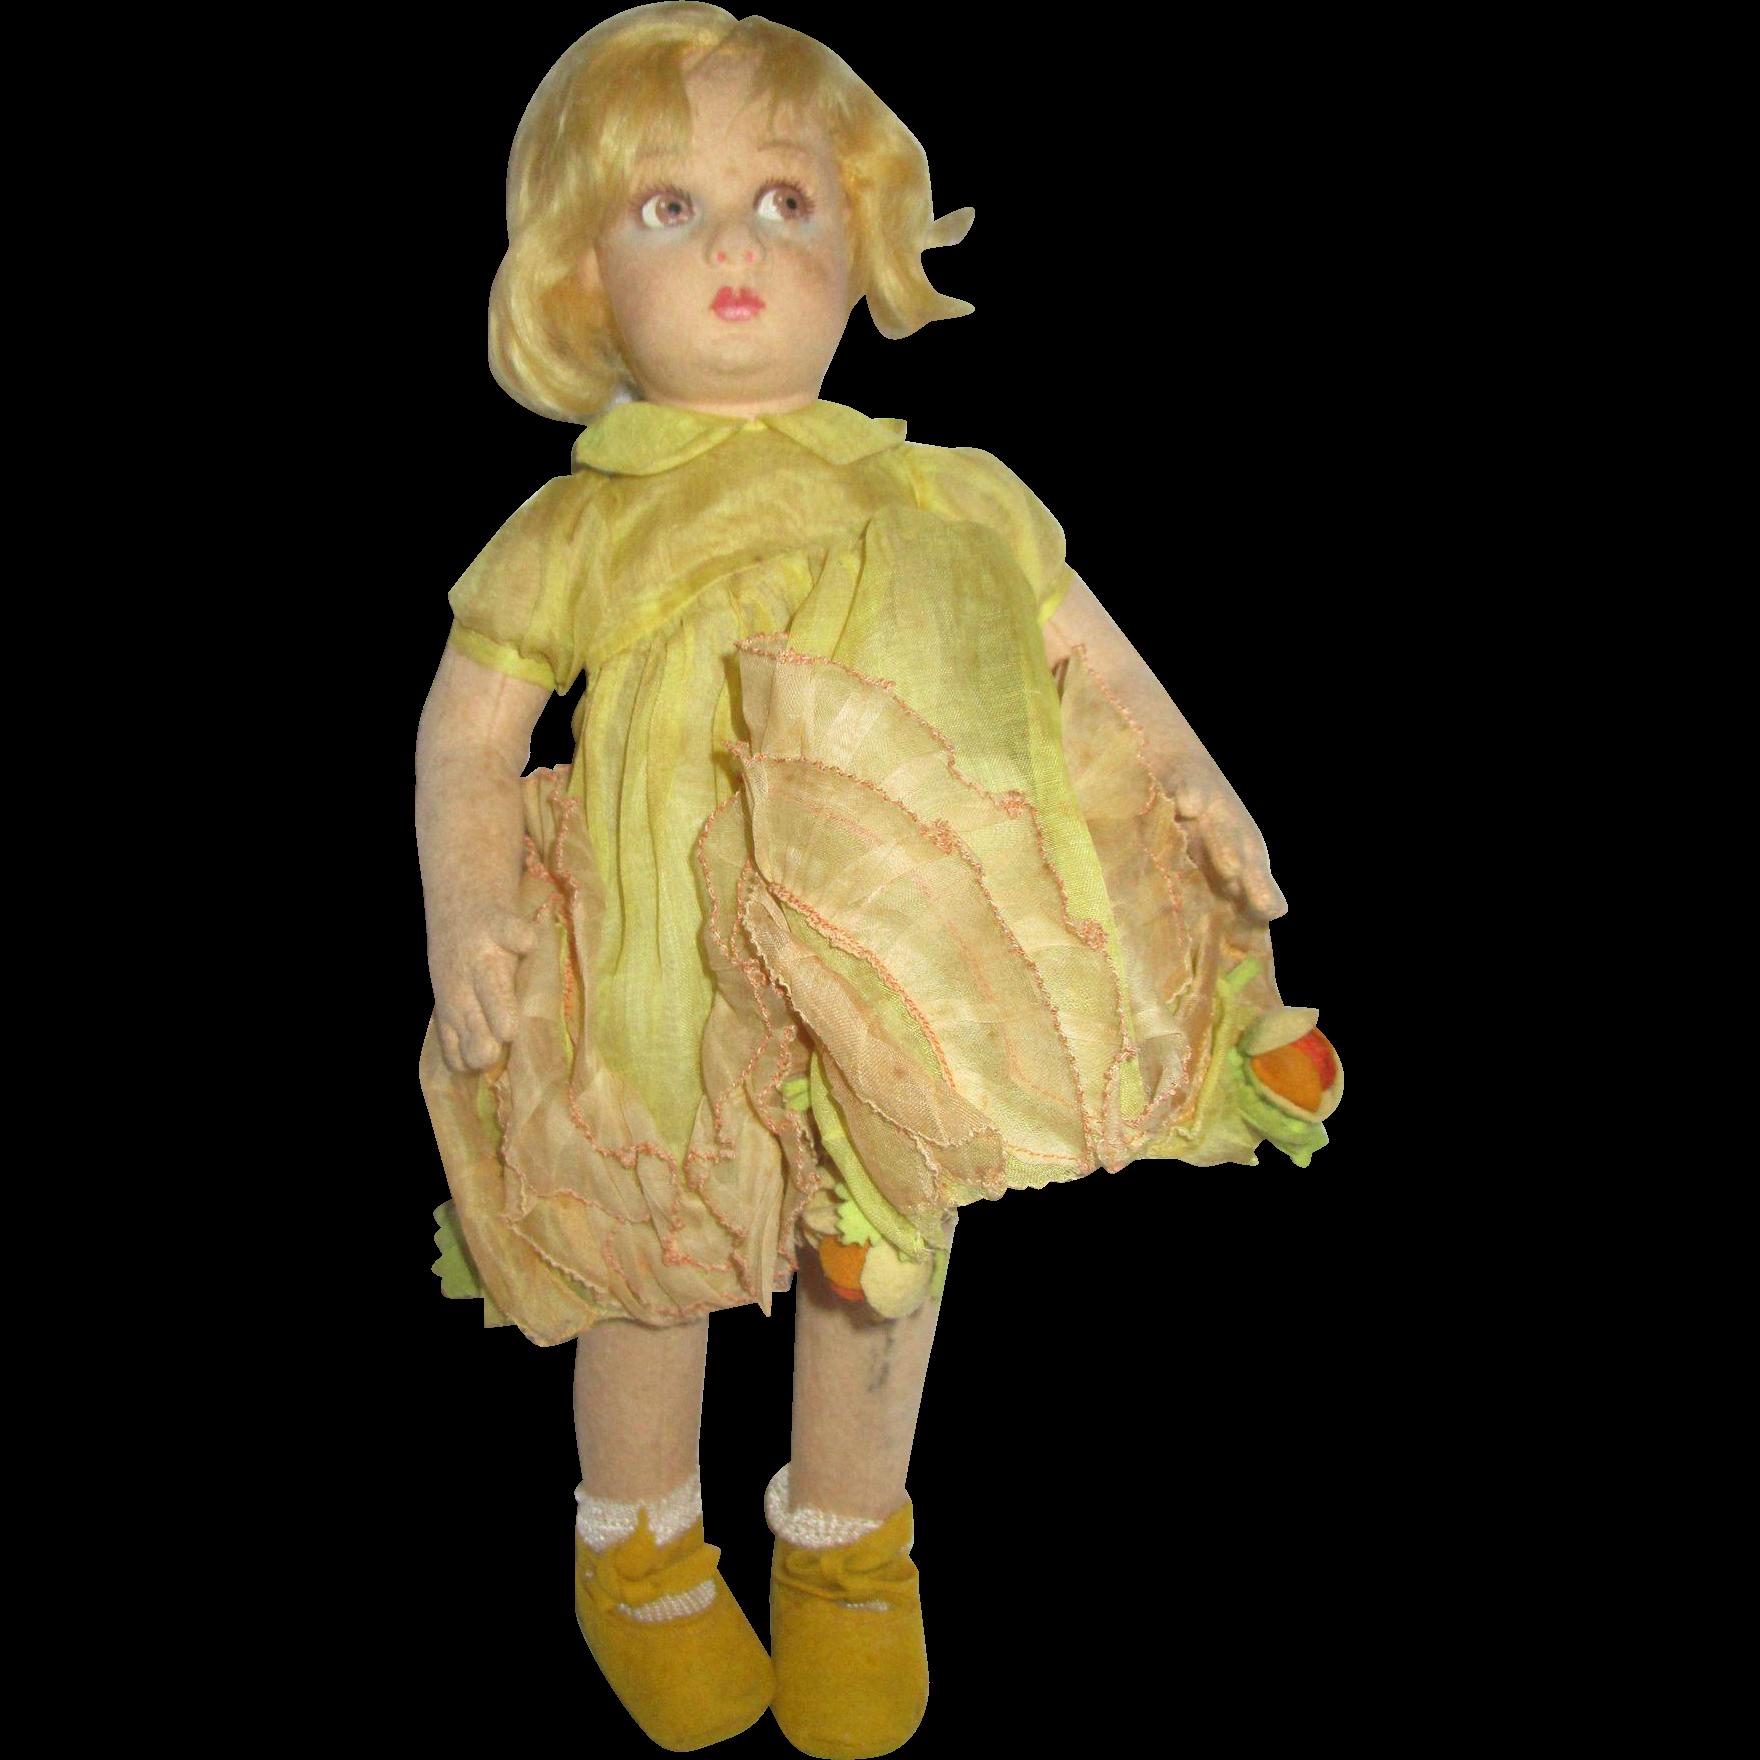 Lenci doll pouty girl in original dress cloth Italia Italy Bambola all original 1930's